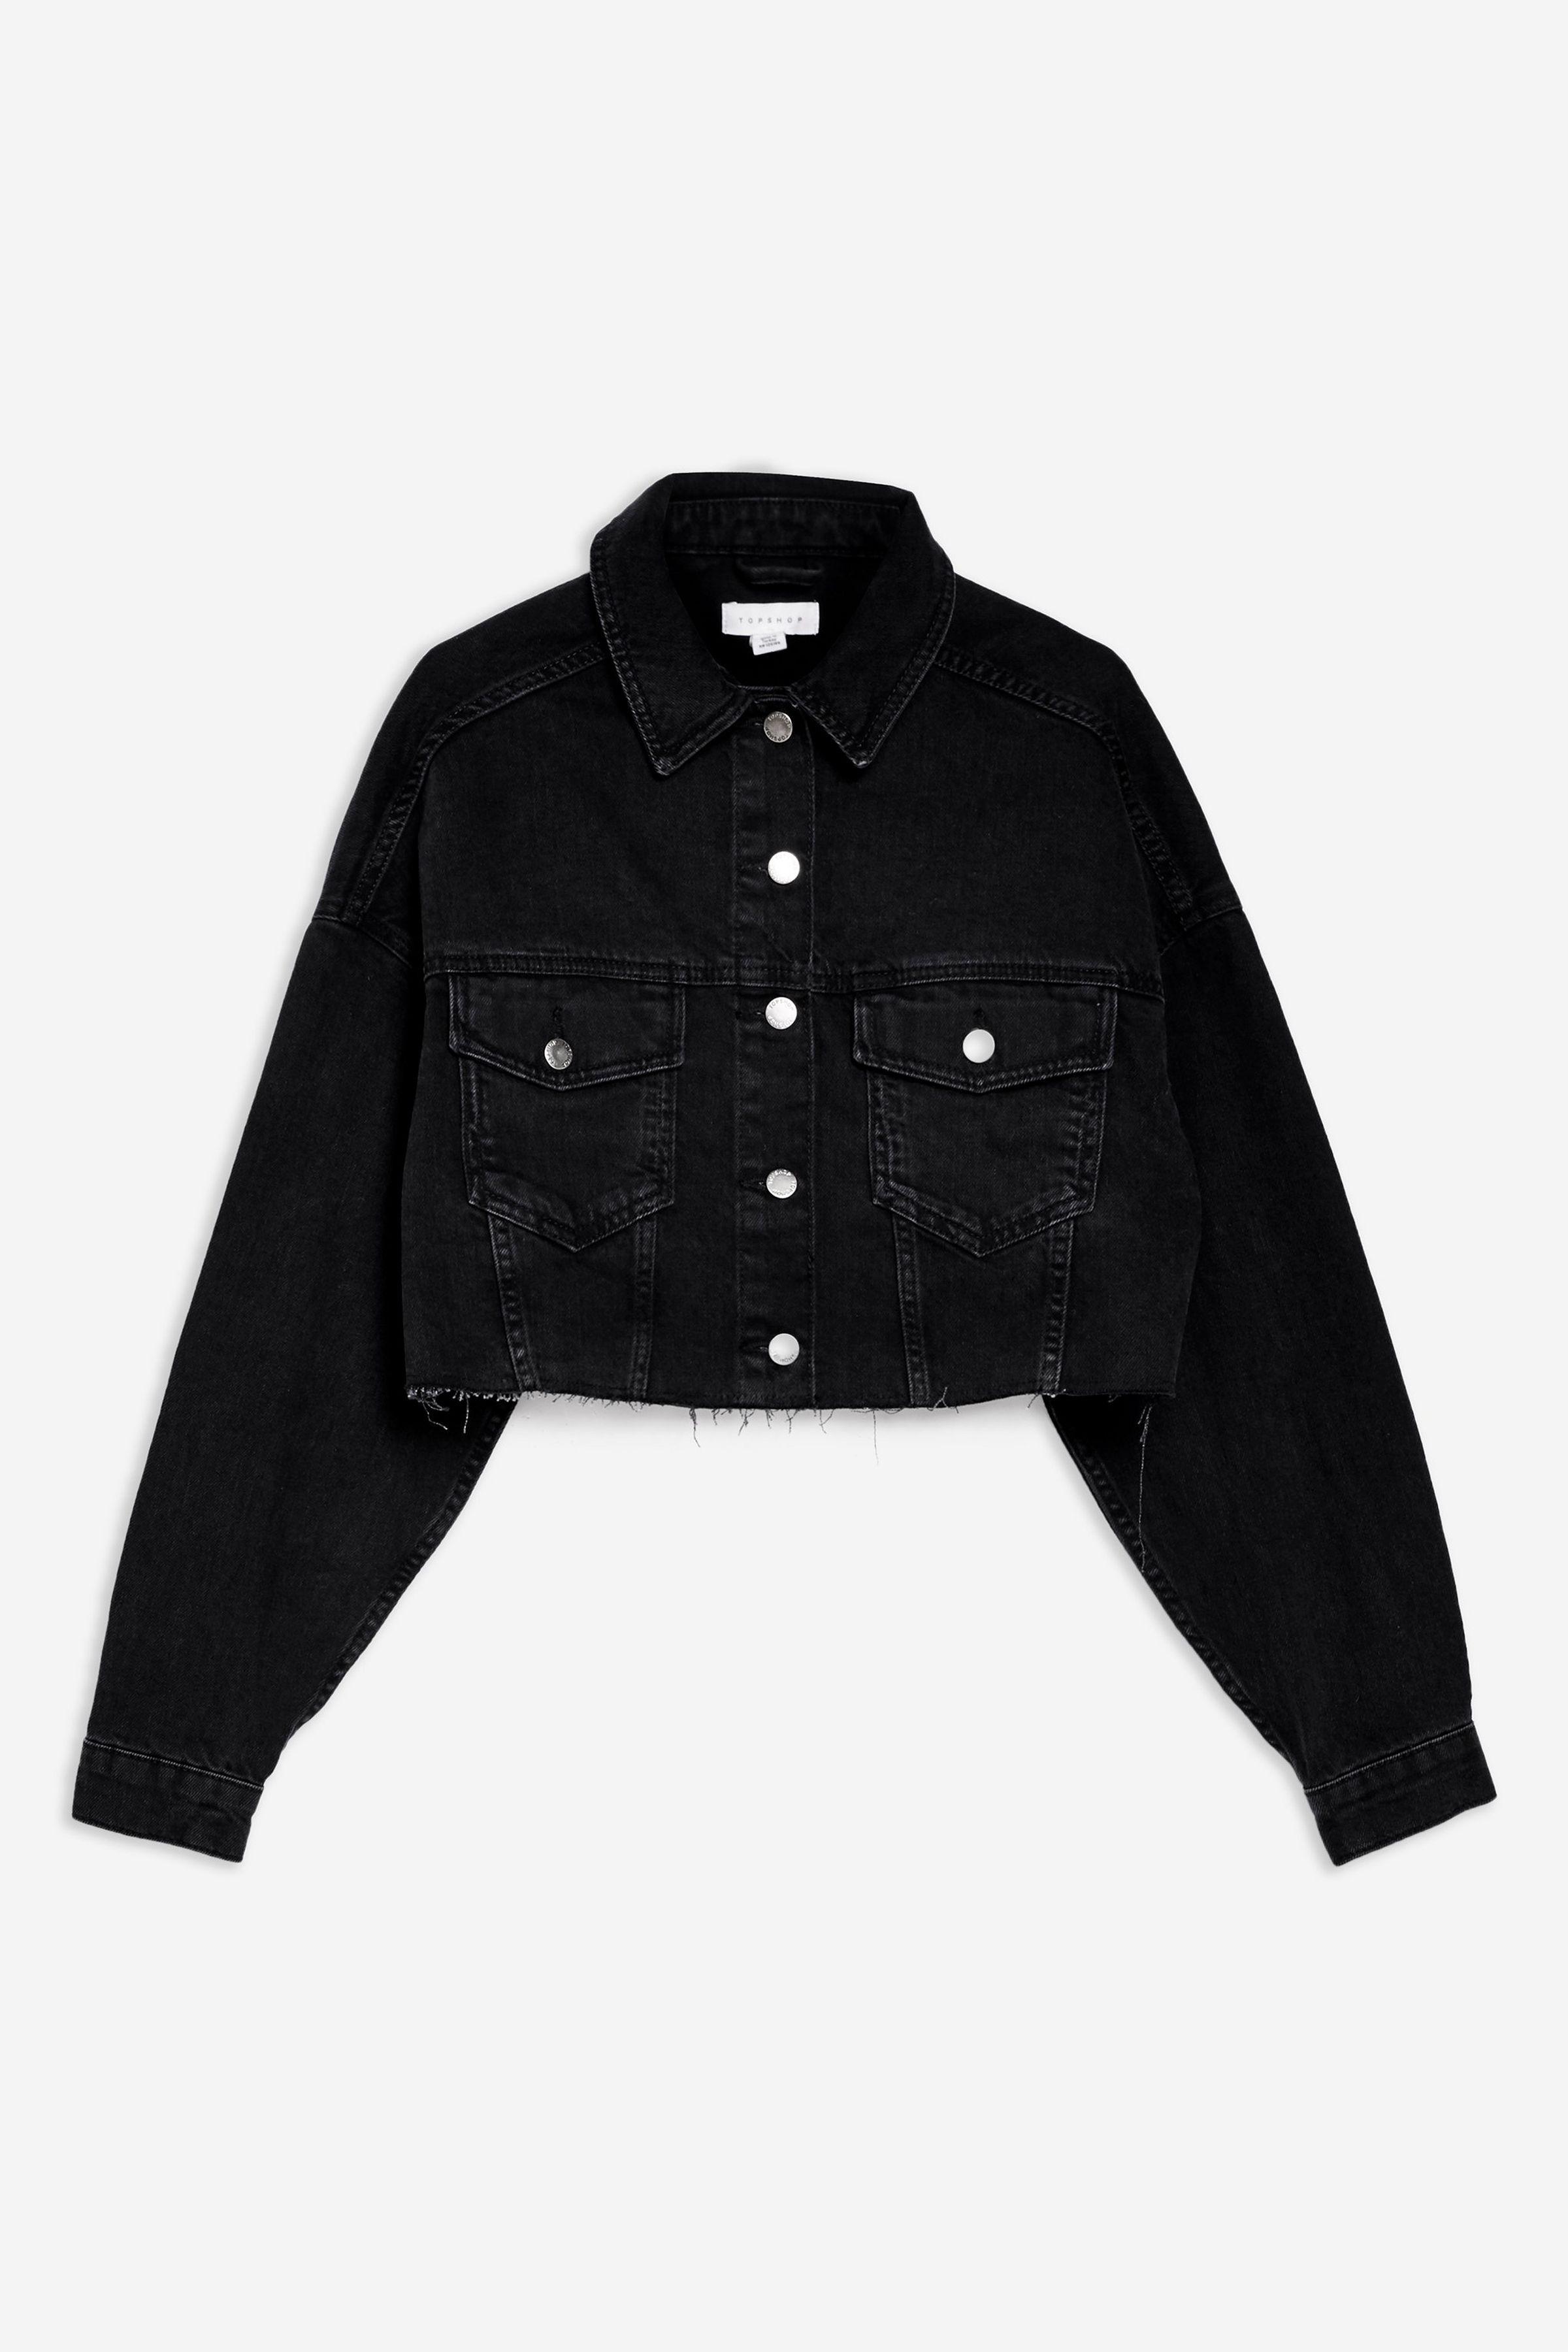 Washed Black Hacked Off Denim Cropped Jacket Jean Jacket Outfits Cropped Denim Jacket Jackets